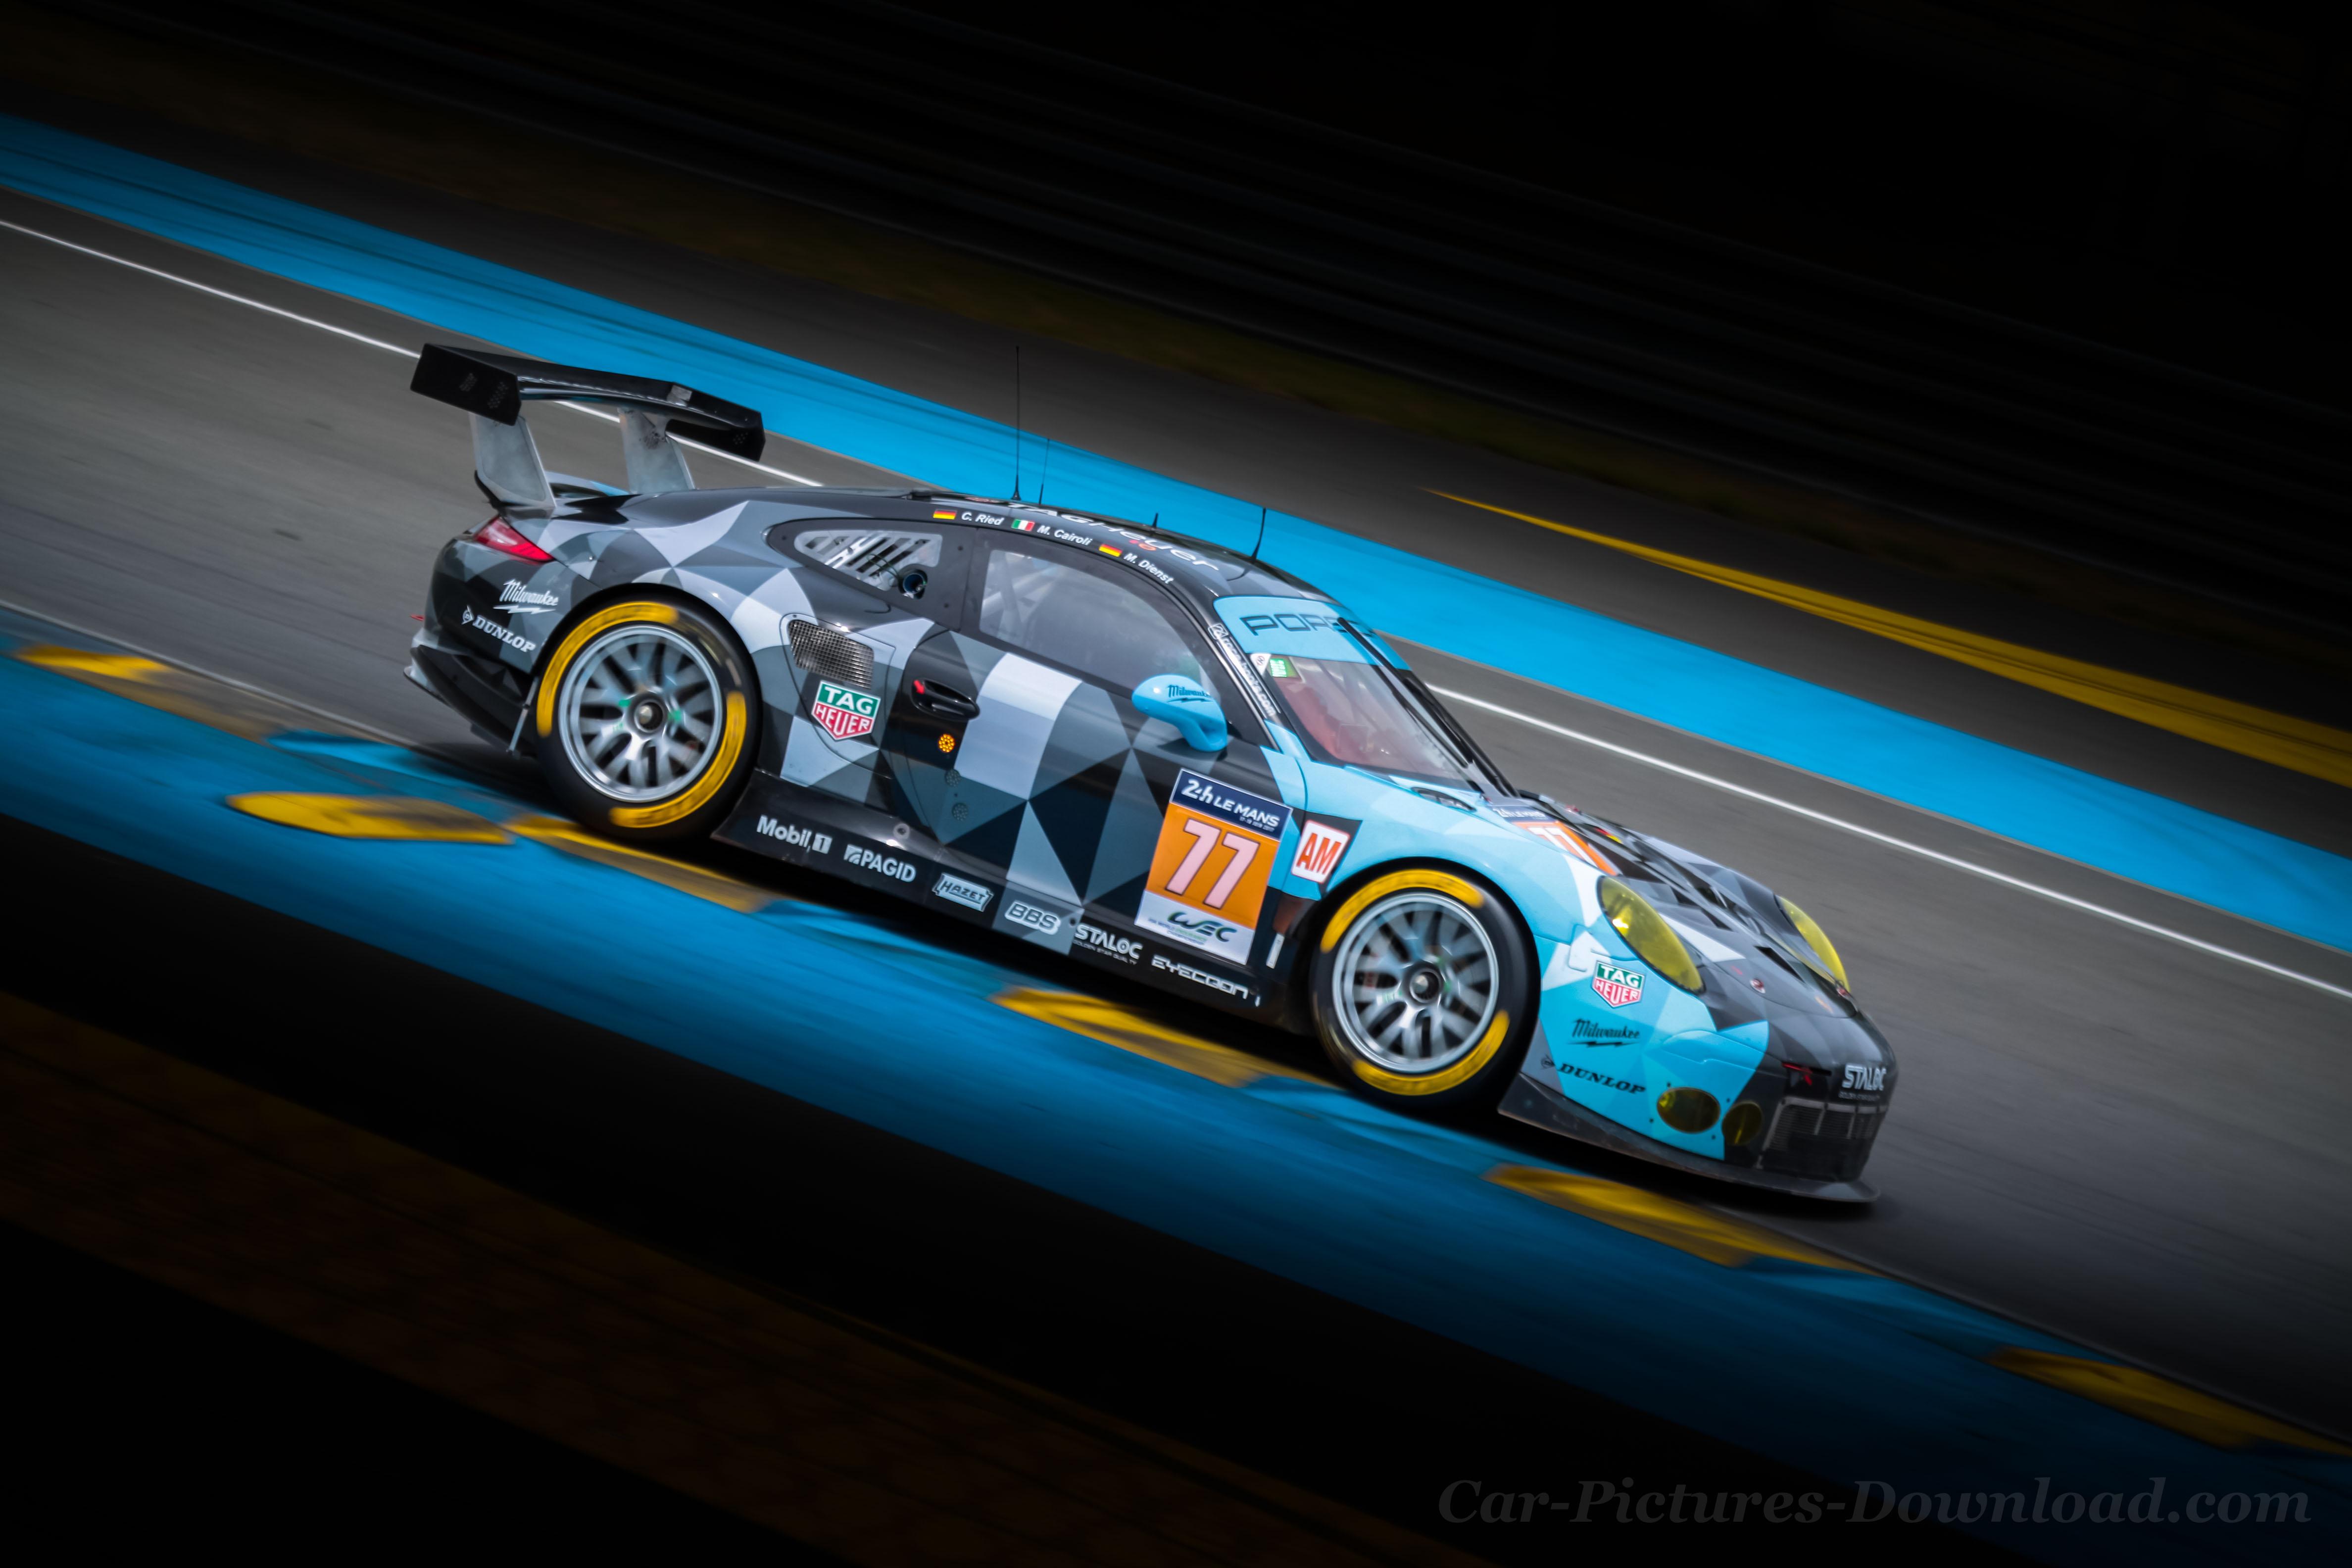 Porsche Racing Car Wallpaper - Touring Car Racing , HD Wallpaper & Backgrounds